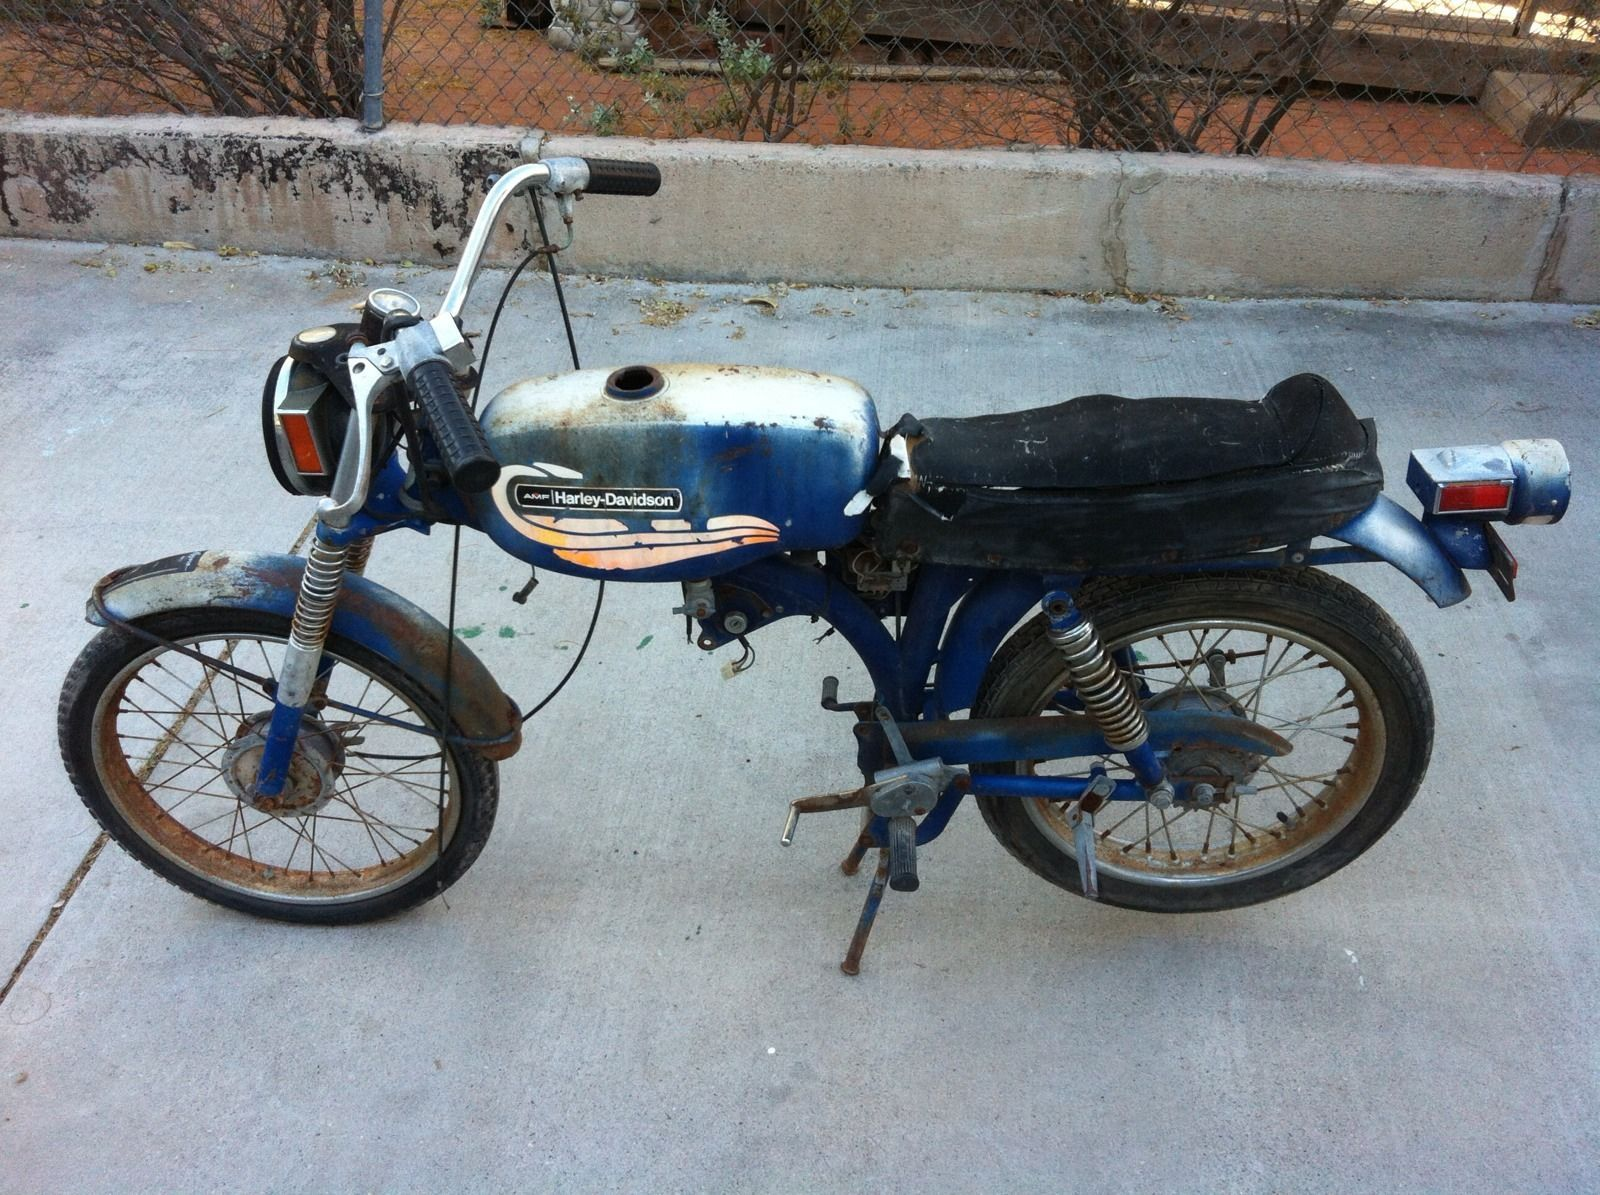 1972 Harley Davidson Leggero 65cc M65 Aermacchi Sportster rolling ...